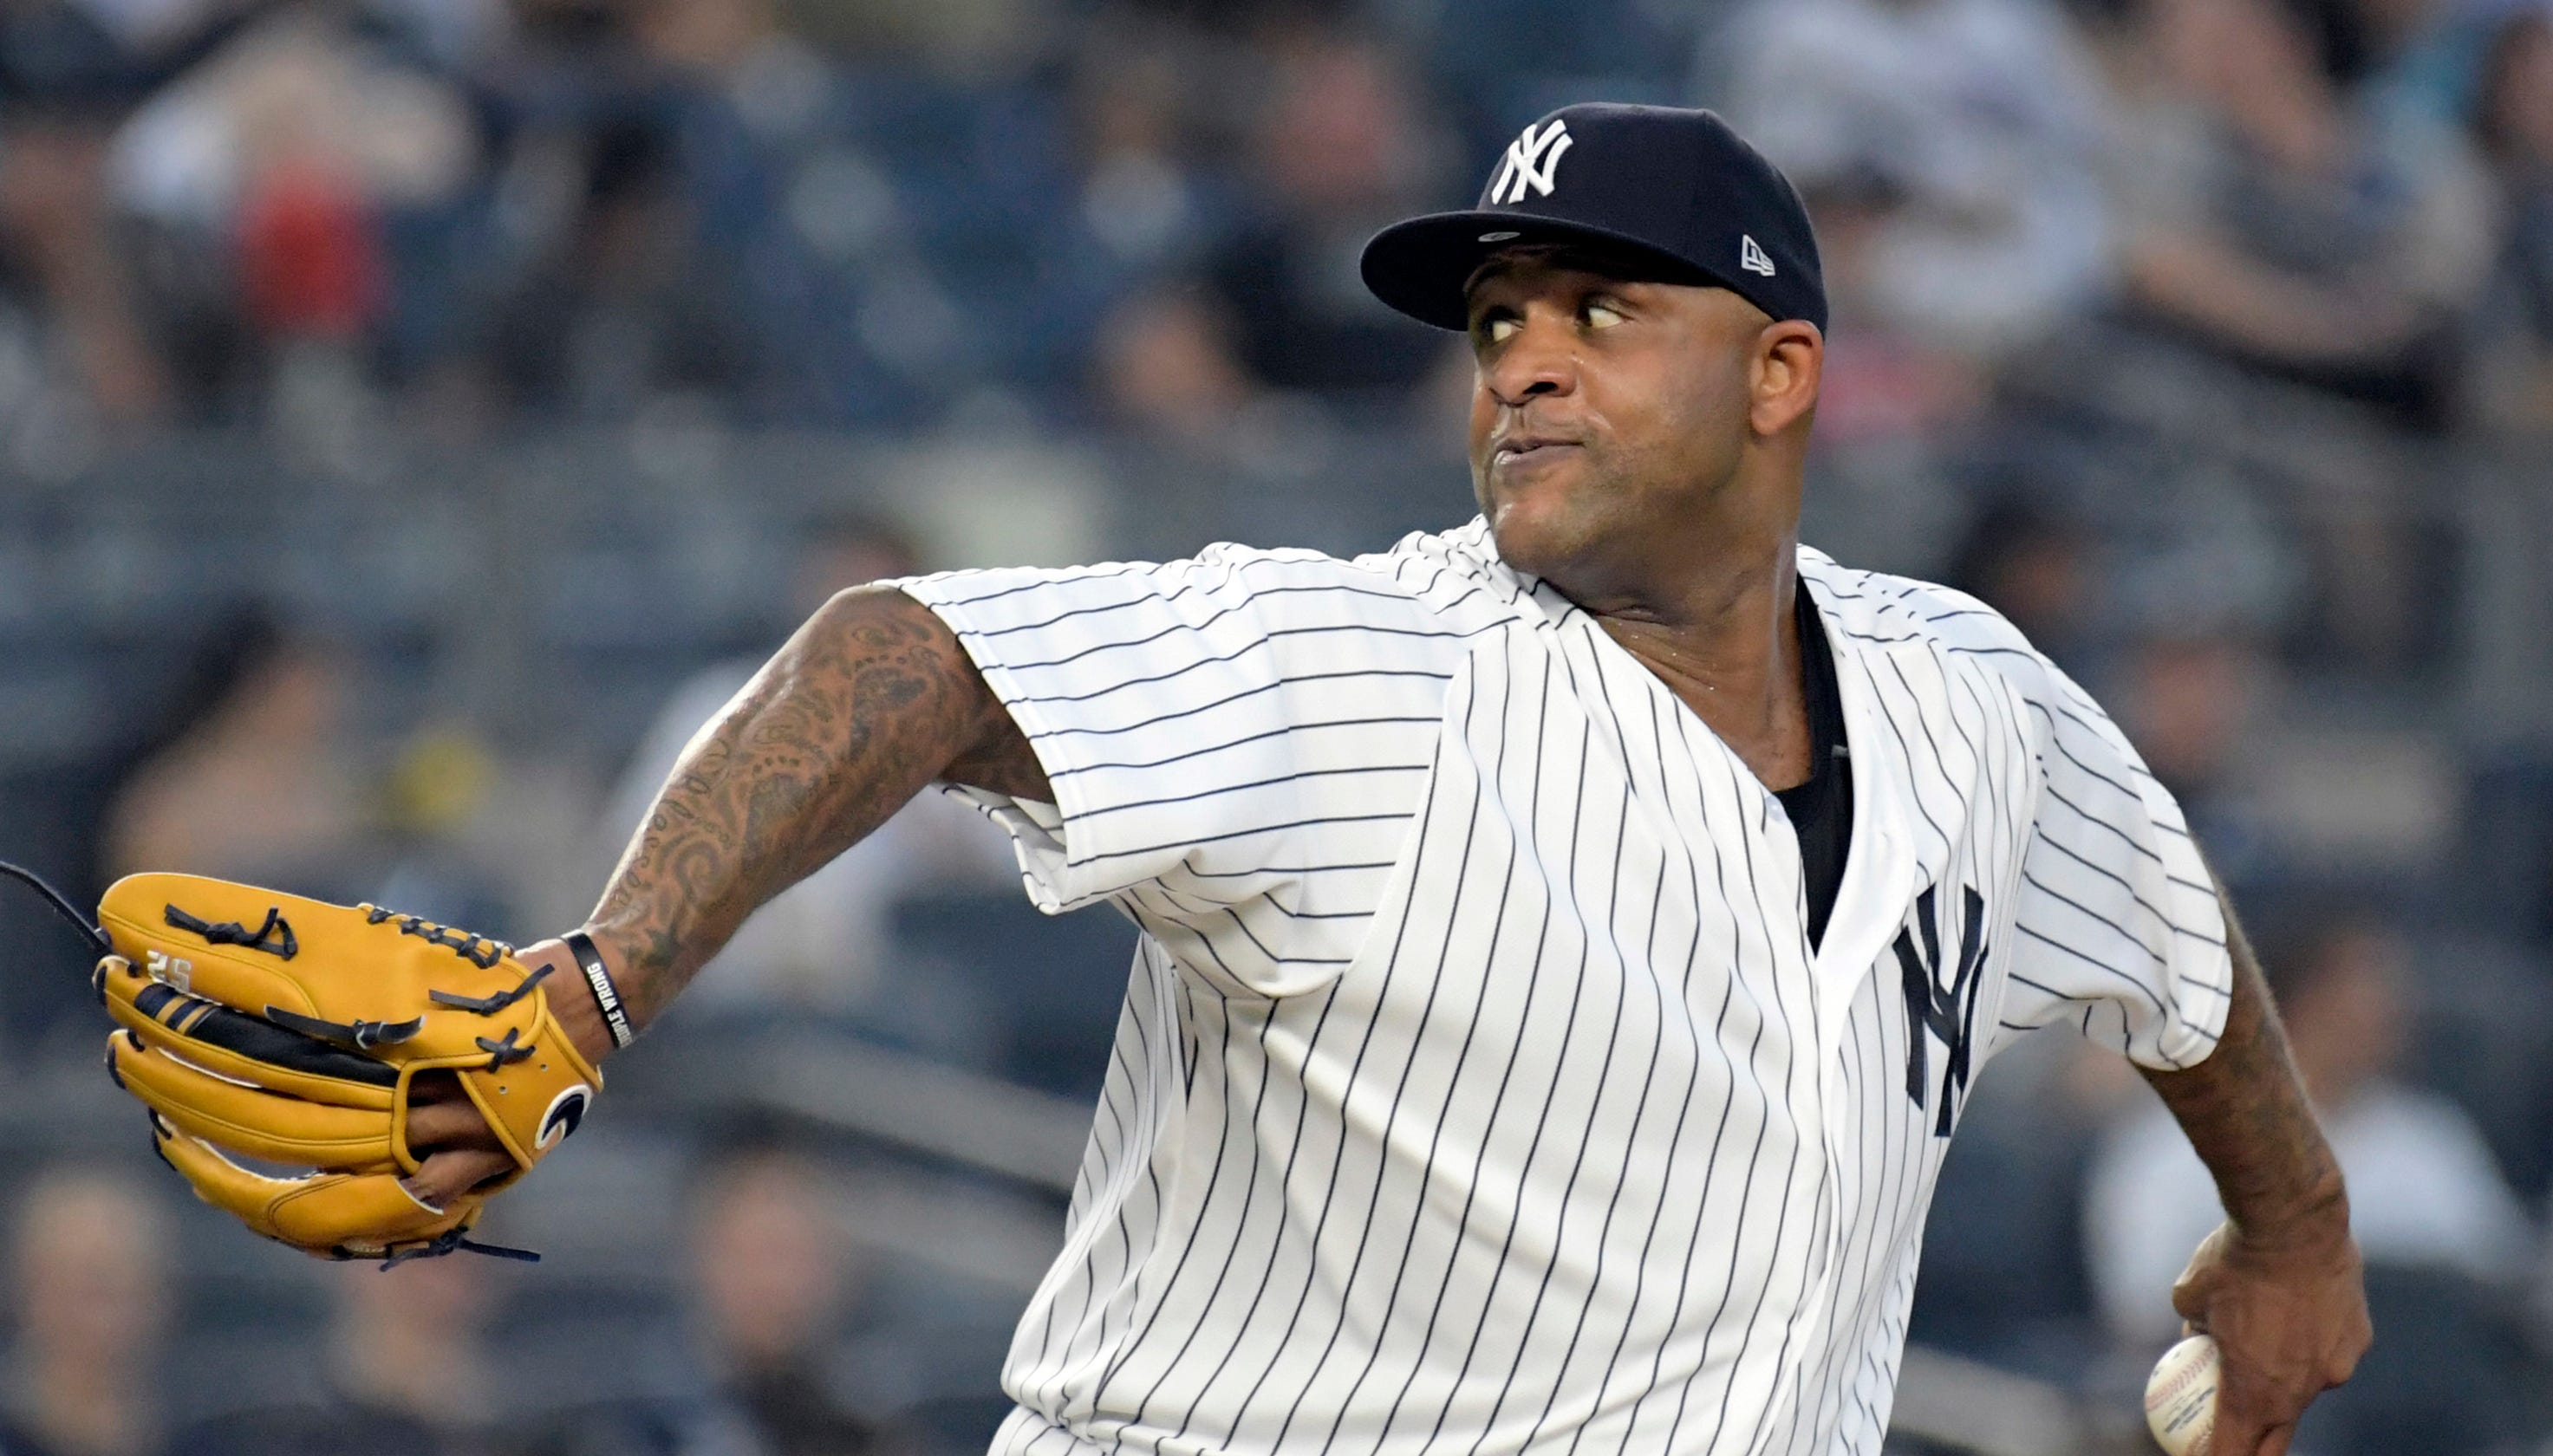 bcbbc5378 CC Sabathia returning to New York Yankees on one-year deal